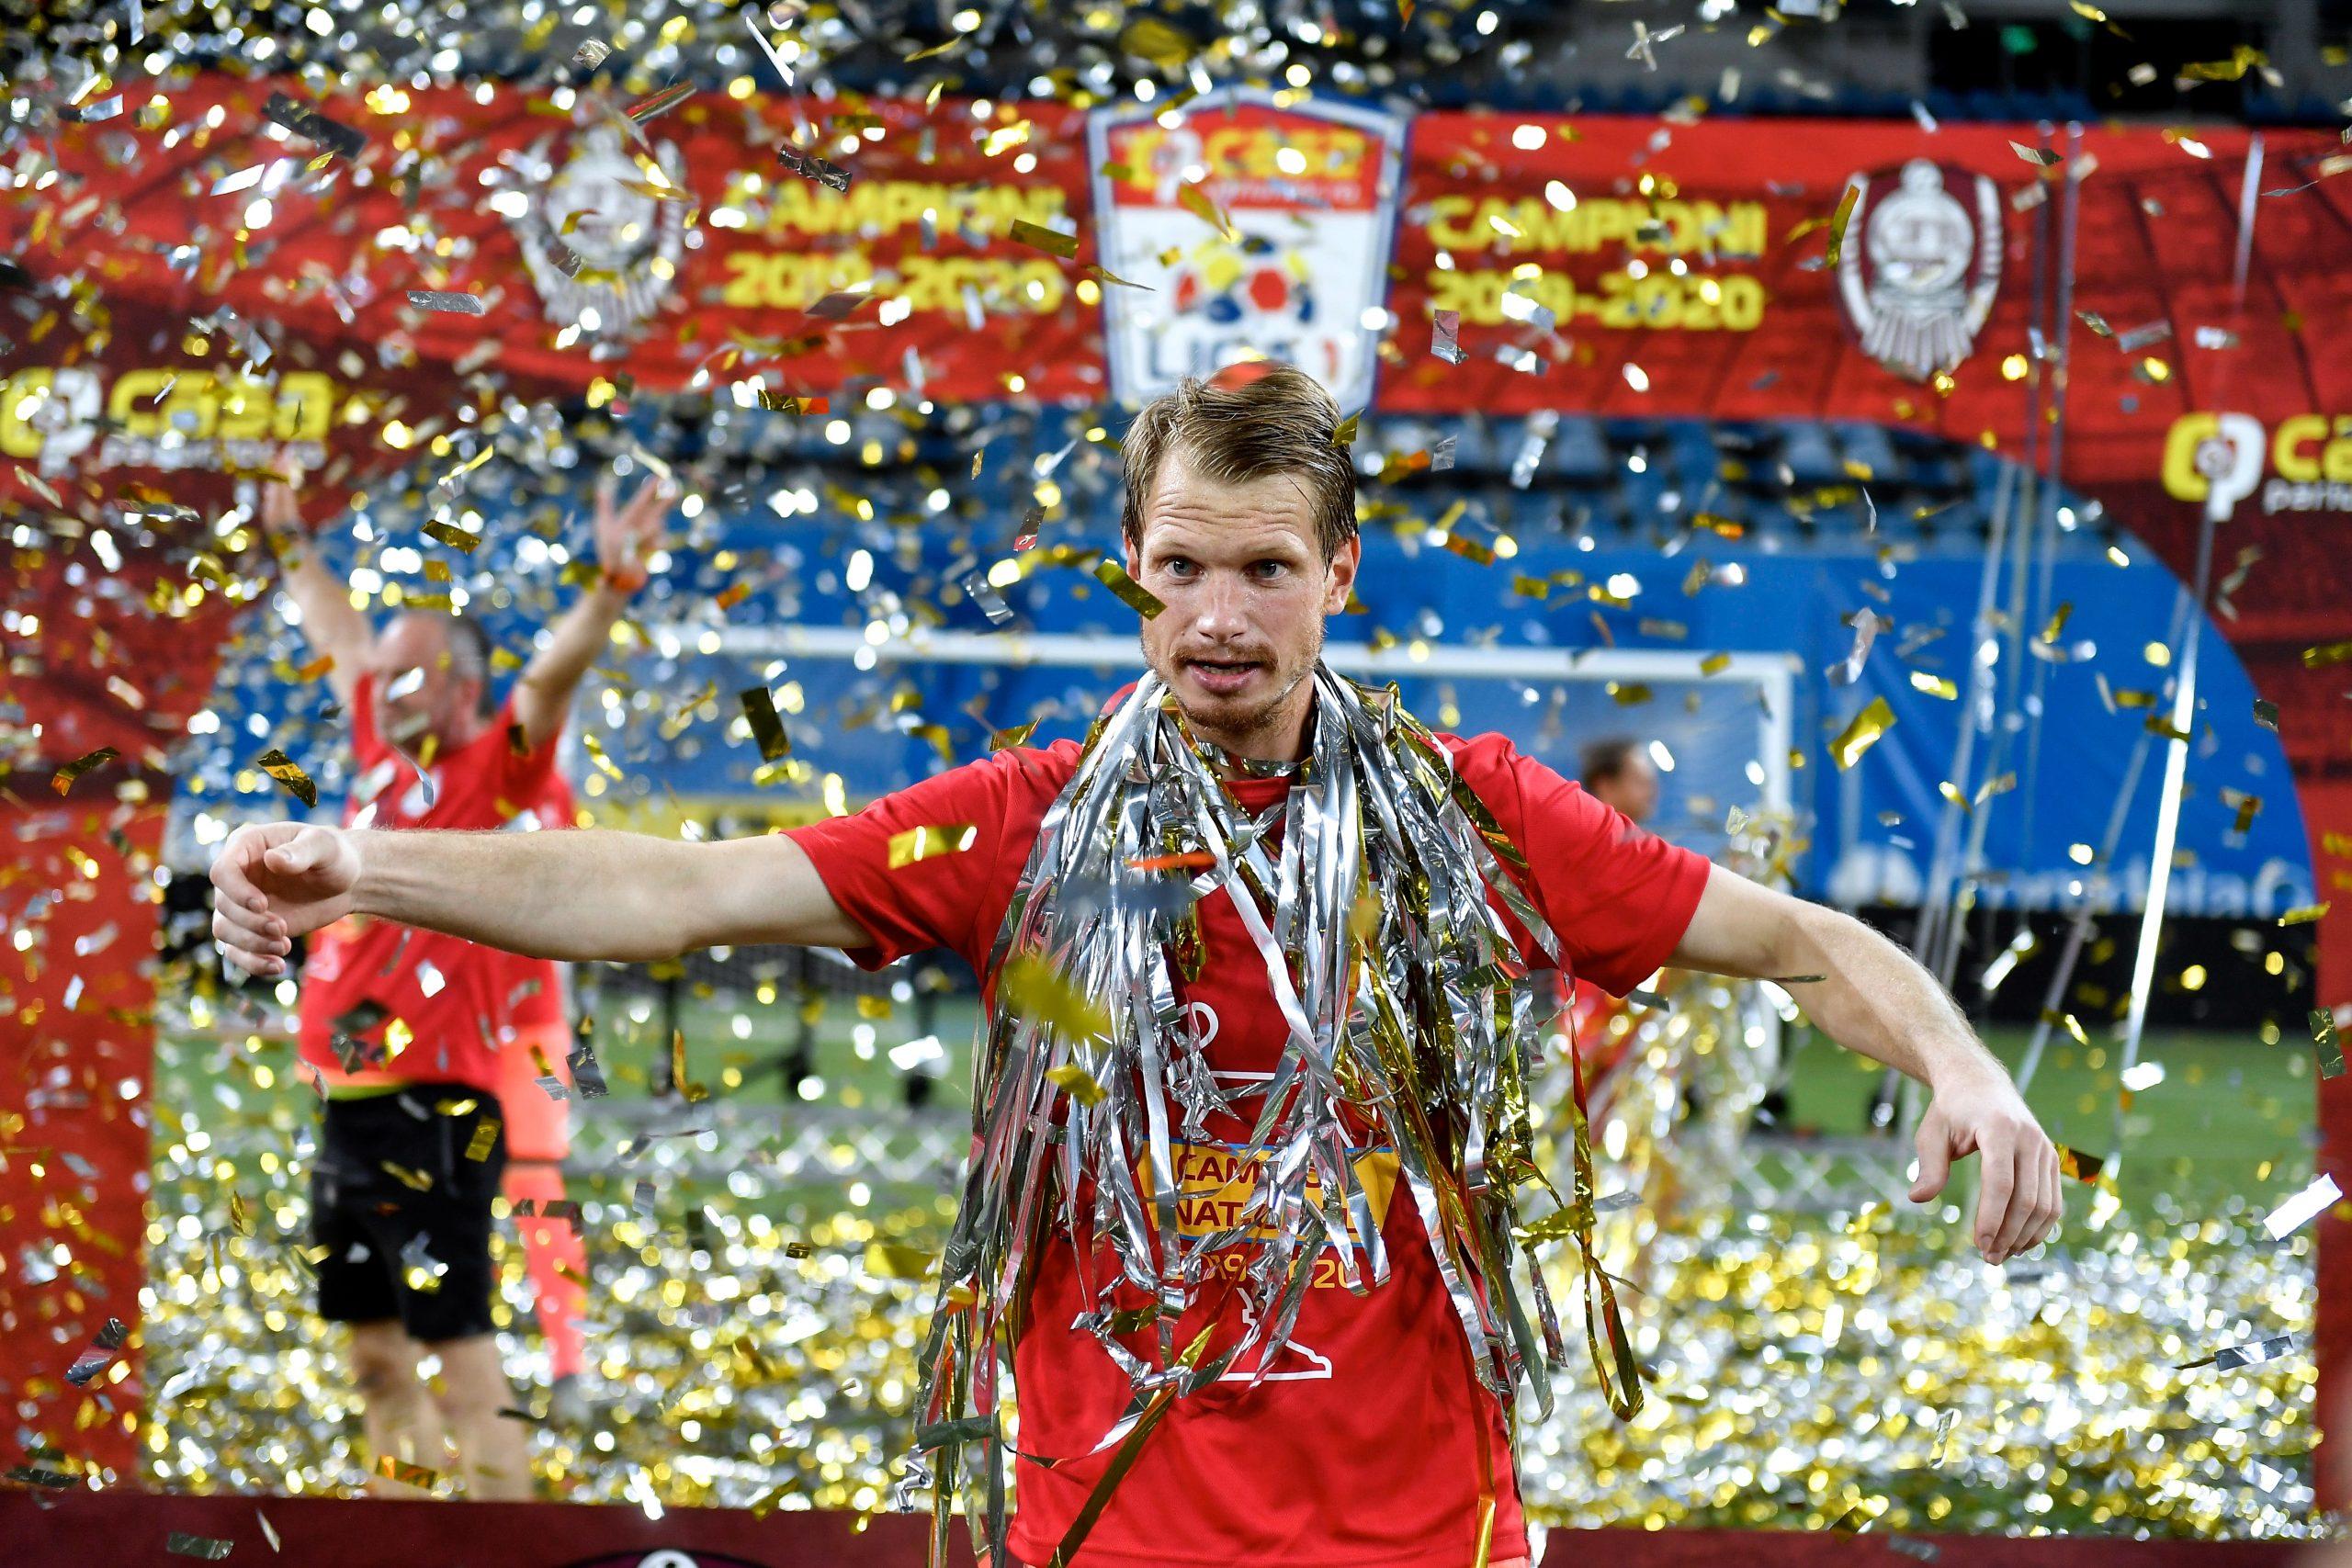 LIGA 1 UNIVERSITATEA CRAIOVA - CFR CLUJ Arlauskis campion confetii INQUAM Alex Nicodim